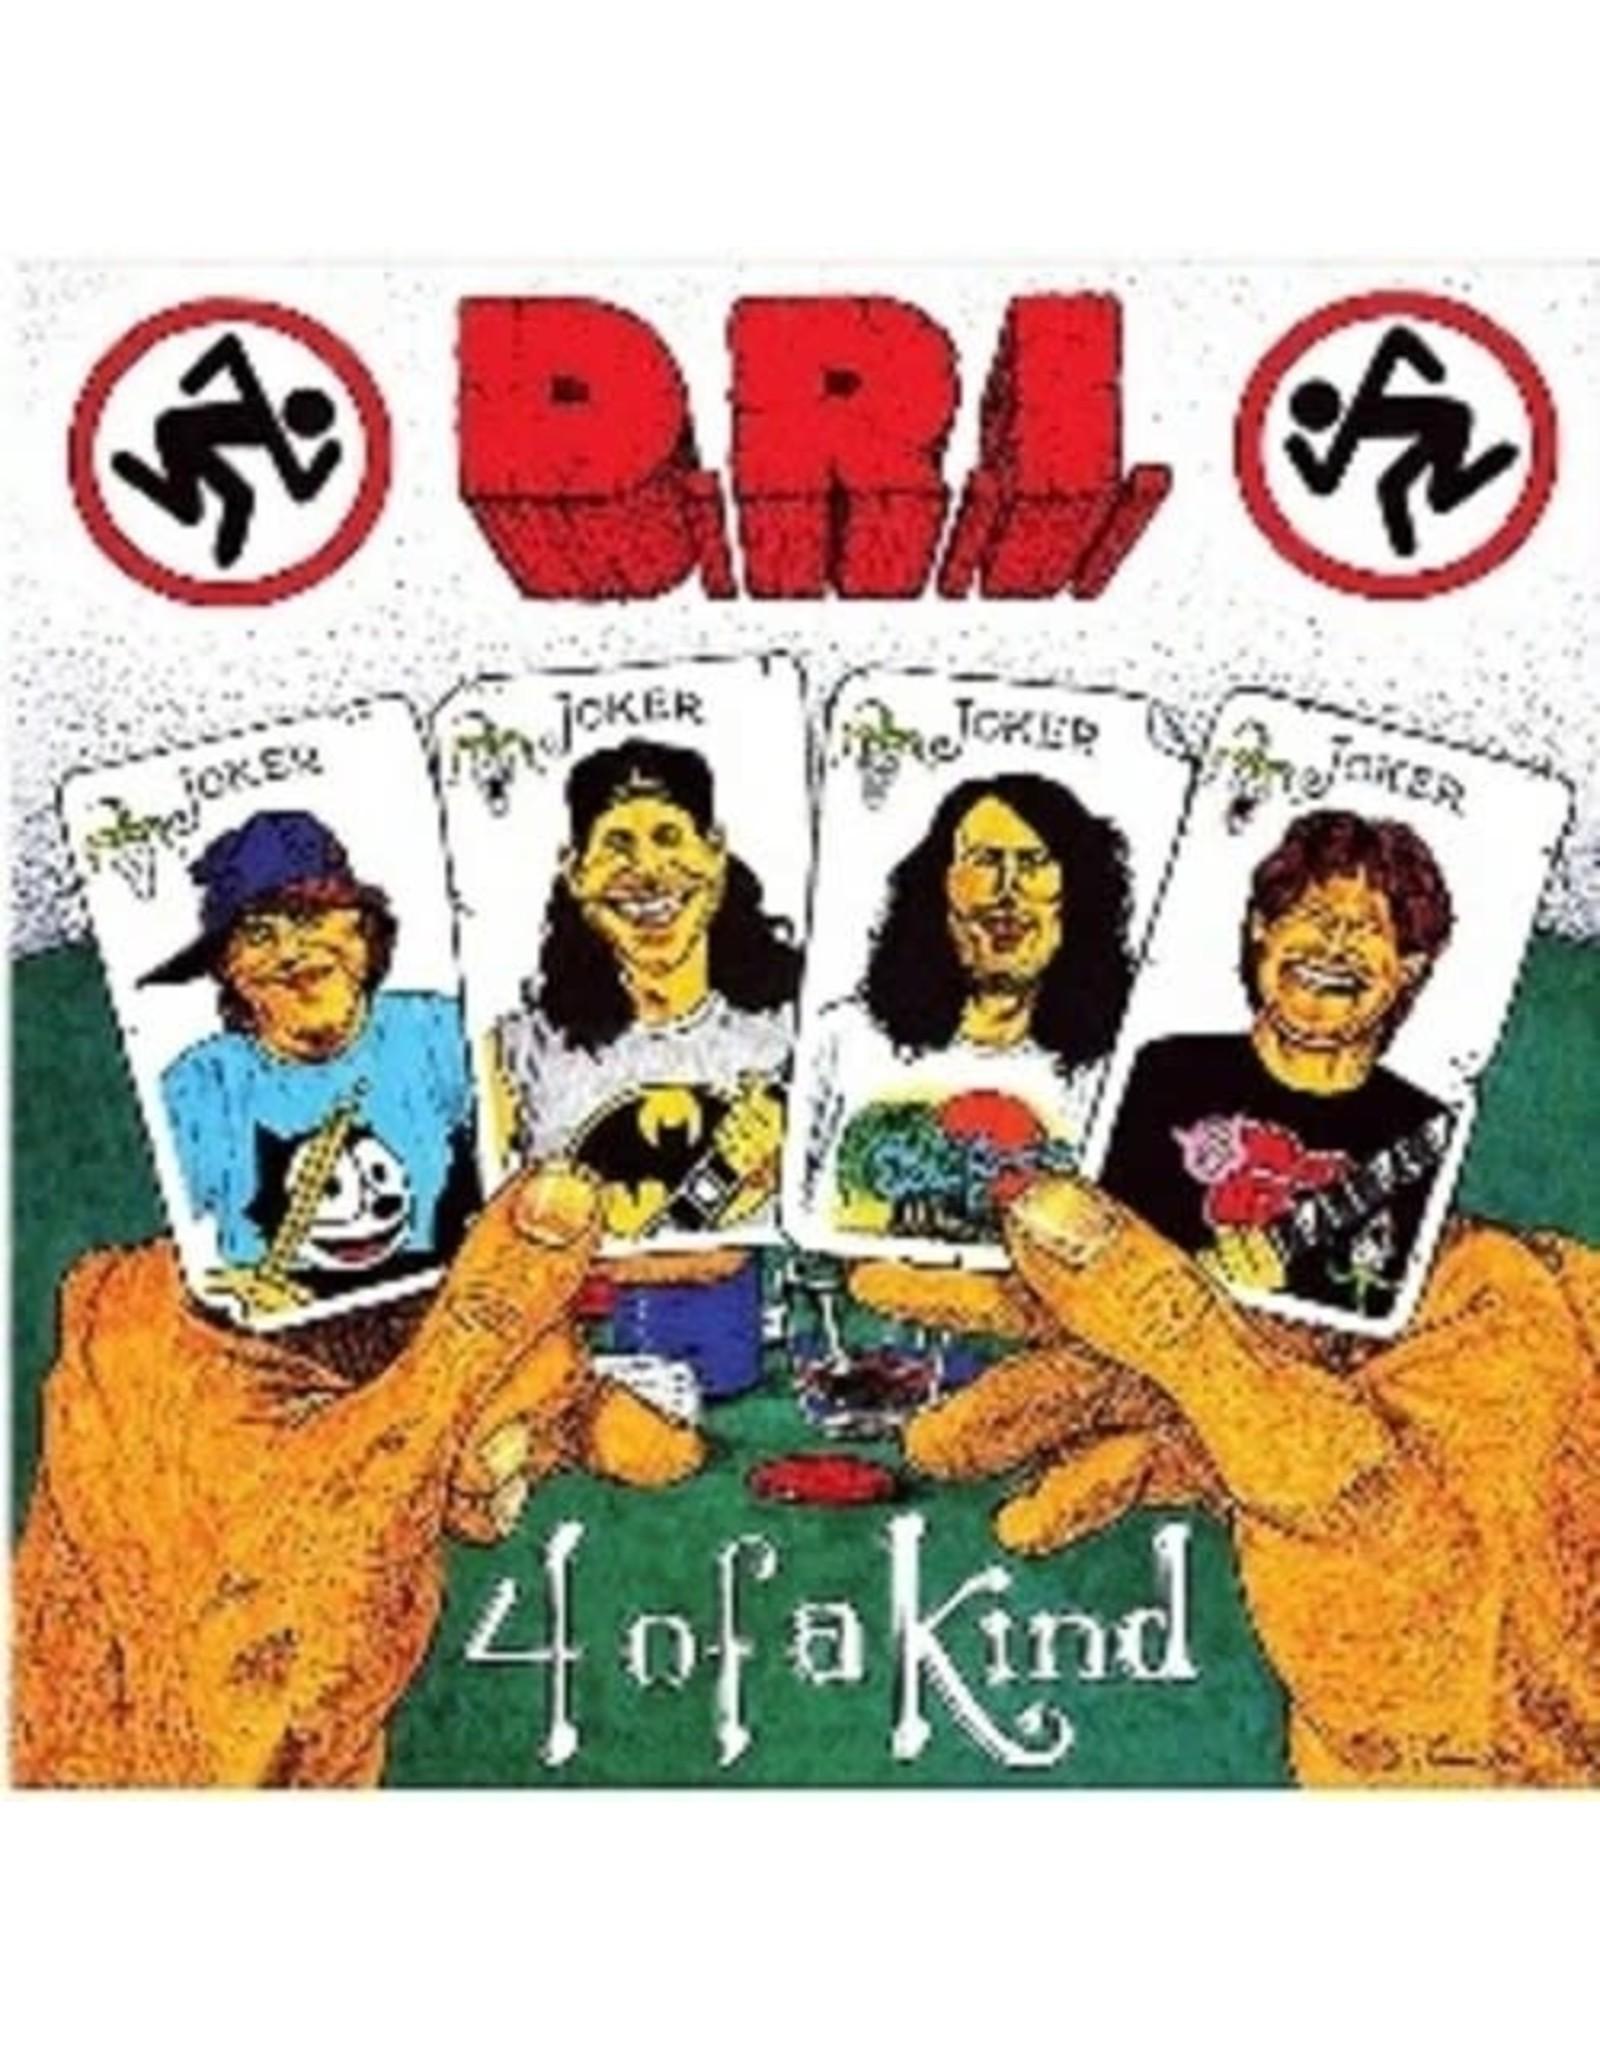 New Vinyl D.R.I. - Four Of A Kind LP